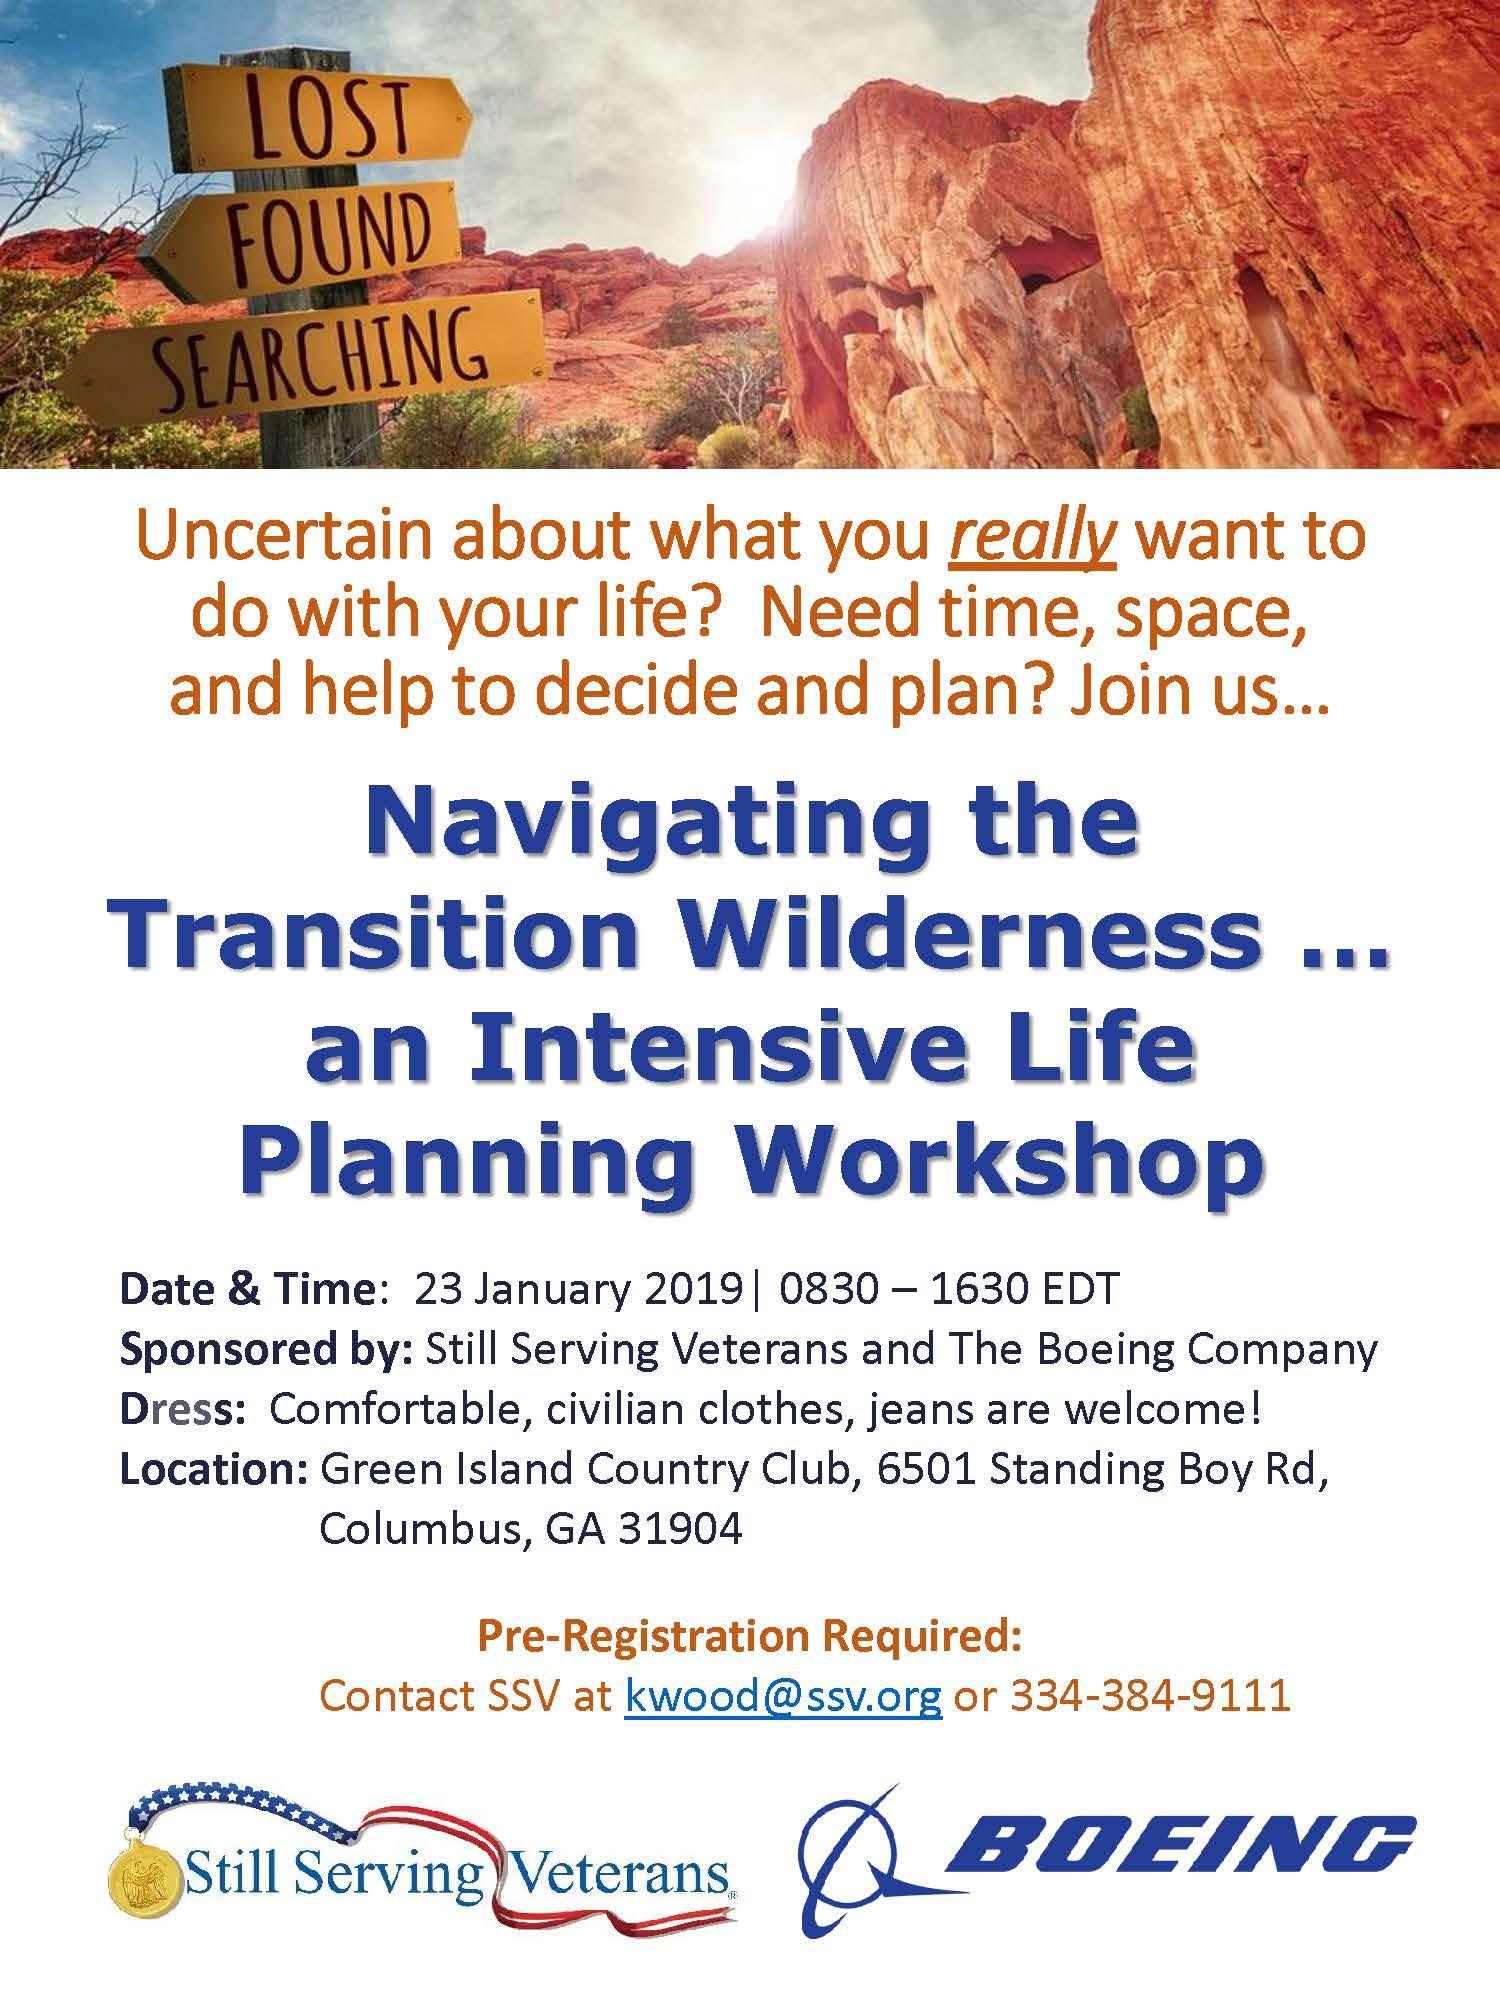 Navigating the Wilderness_Intensive Life Planning Workshop_Website.jpg